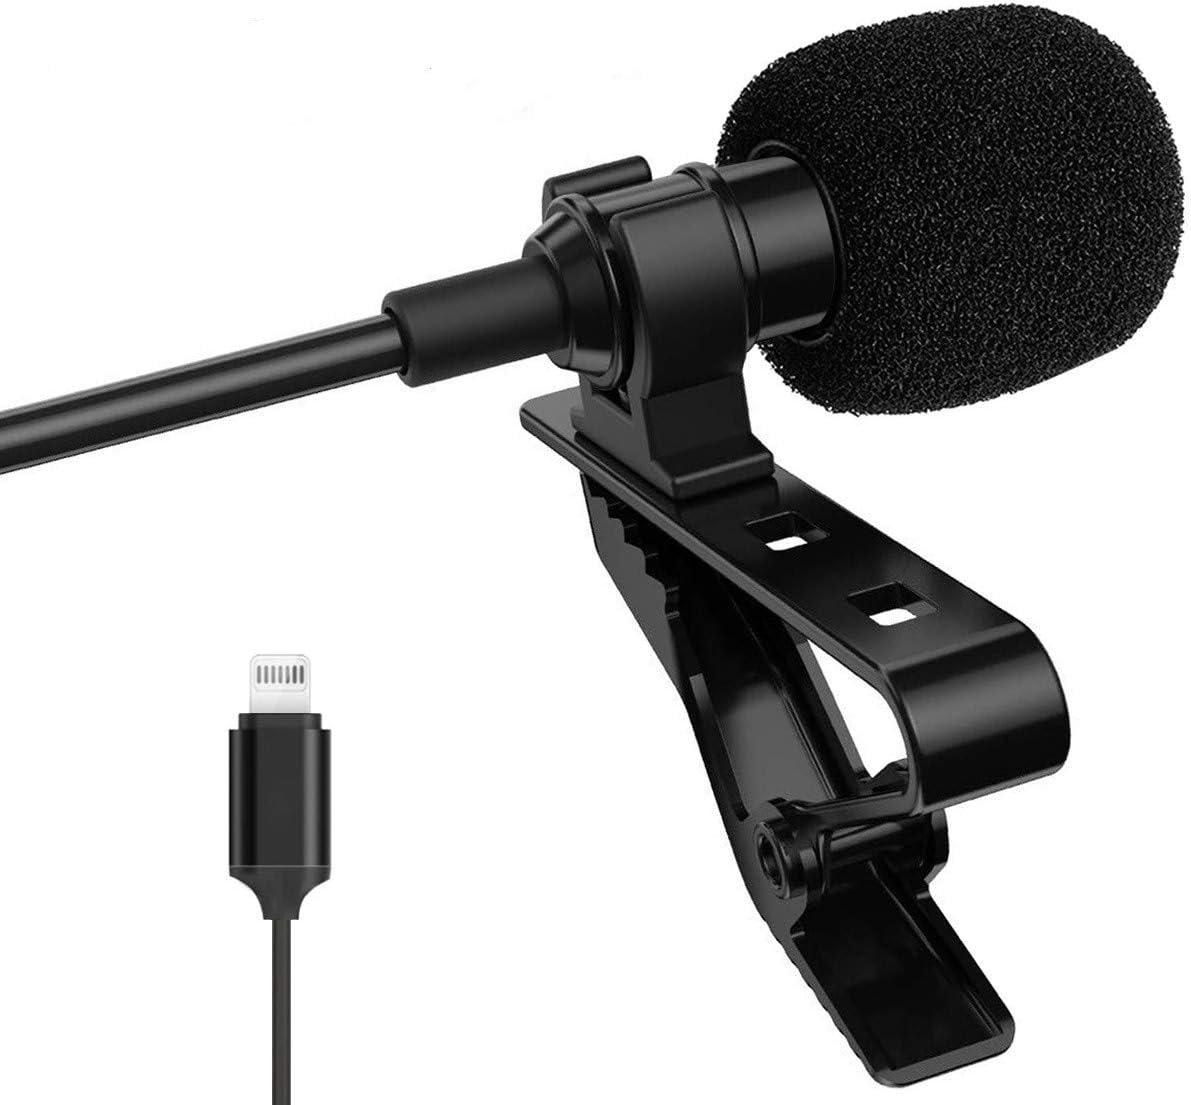 Lavalier Mikrofon Für Iphone Ansteckmikrofon Omnidirektionalem Kondensator Lavalier Mikrofon Für Iphone Ipad Mac Ios 1 5m Musikinstrumente